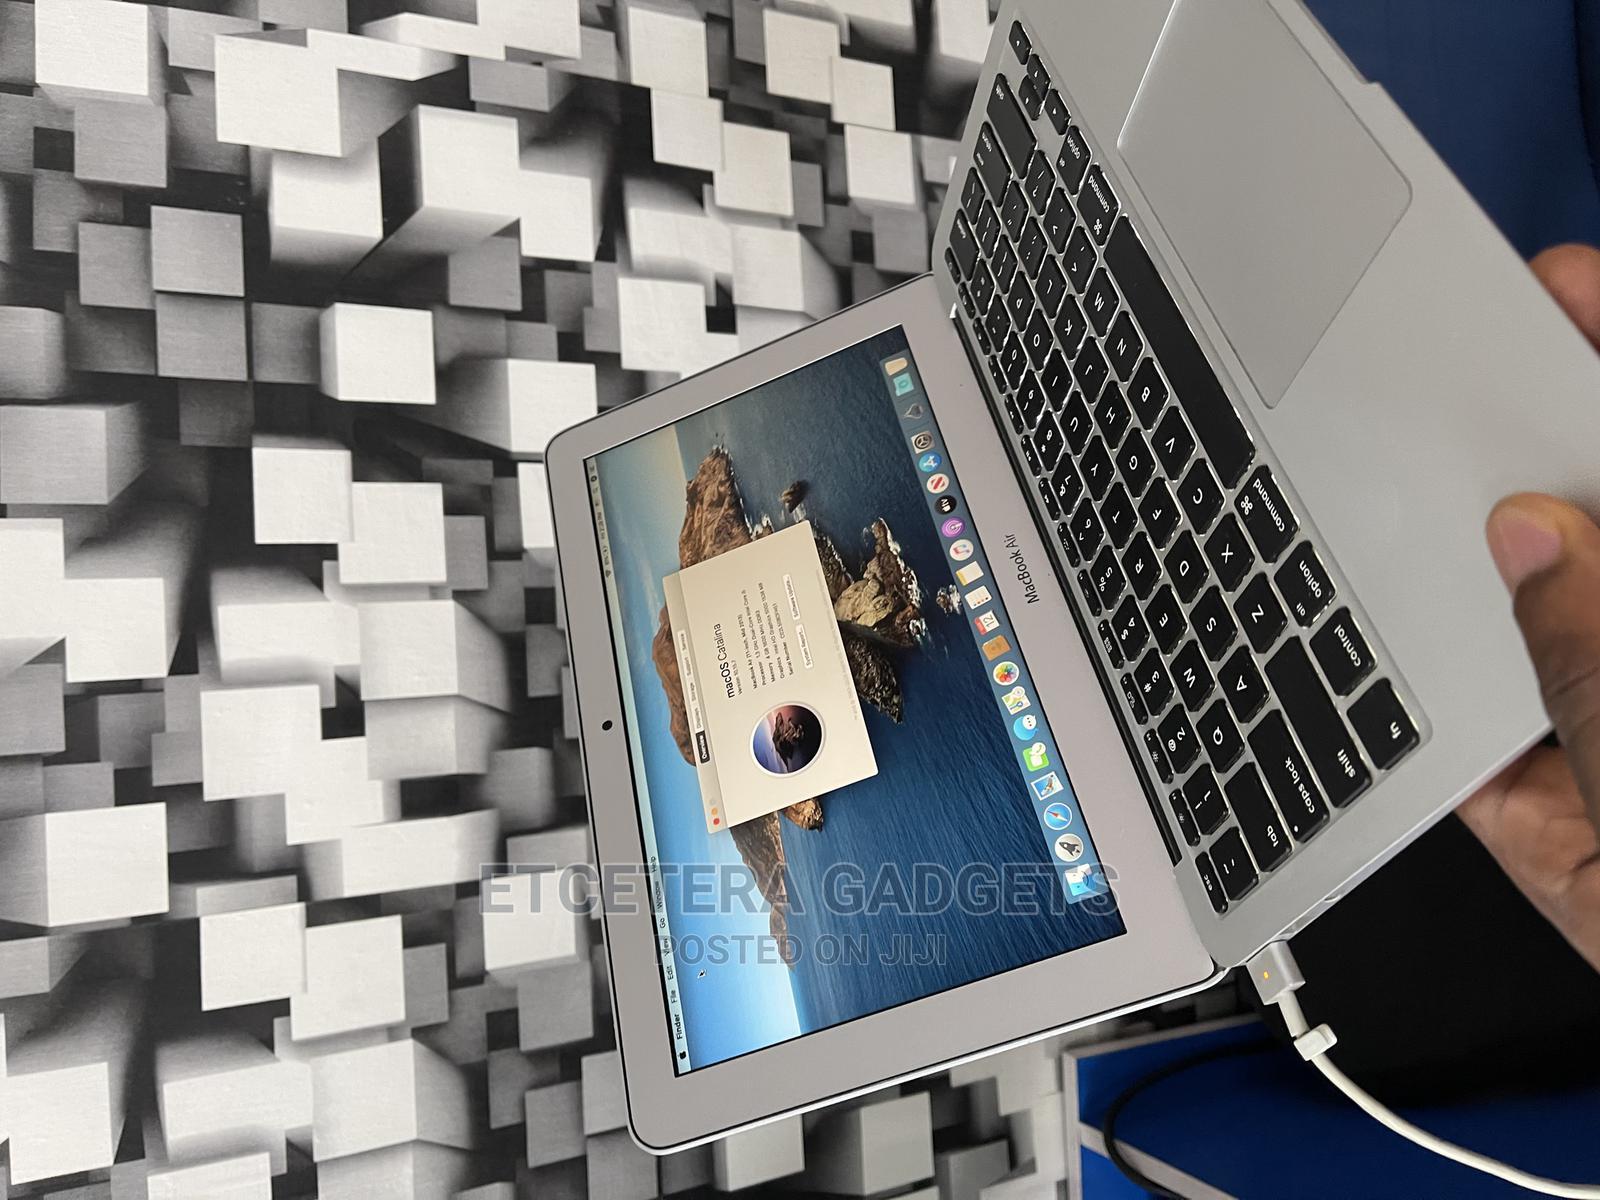 Laptop Apple MacBook Air 2013 8GB Intel Core I7 SSD 512GB | Laptops & Computers for sale in Ikeja, Lagos State, Nigeria